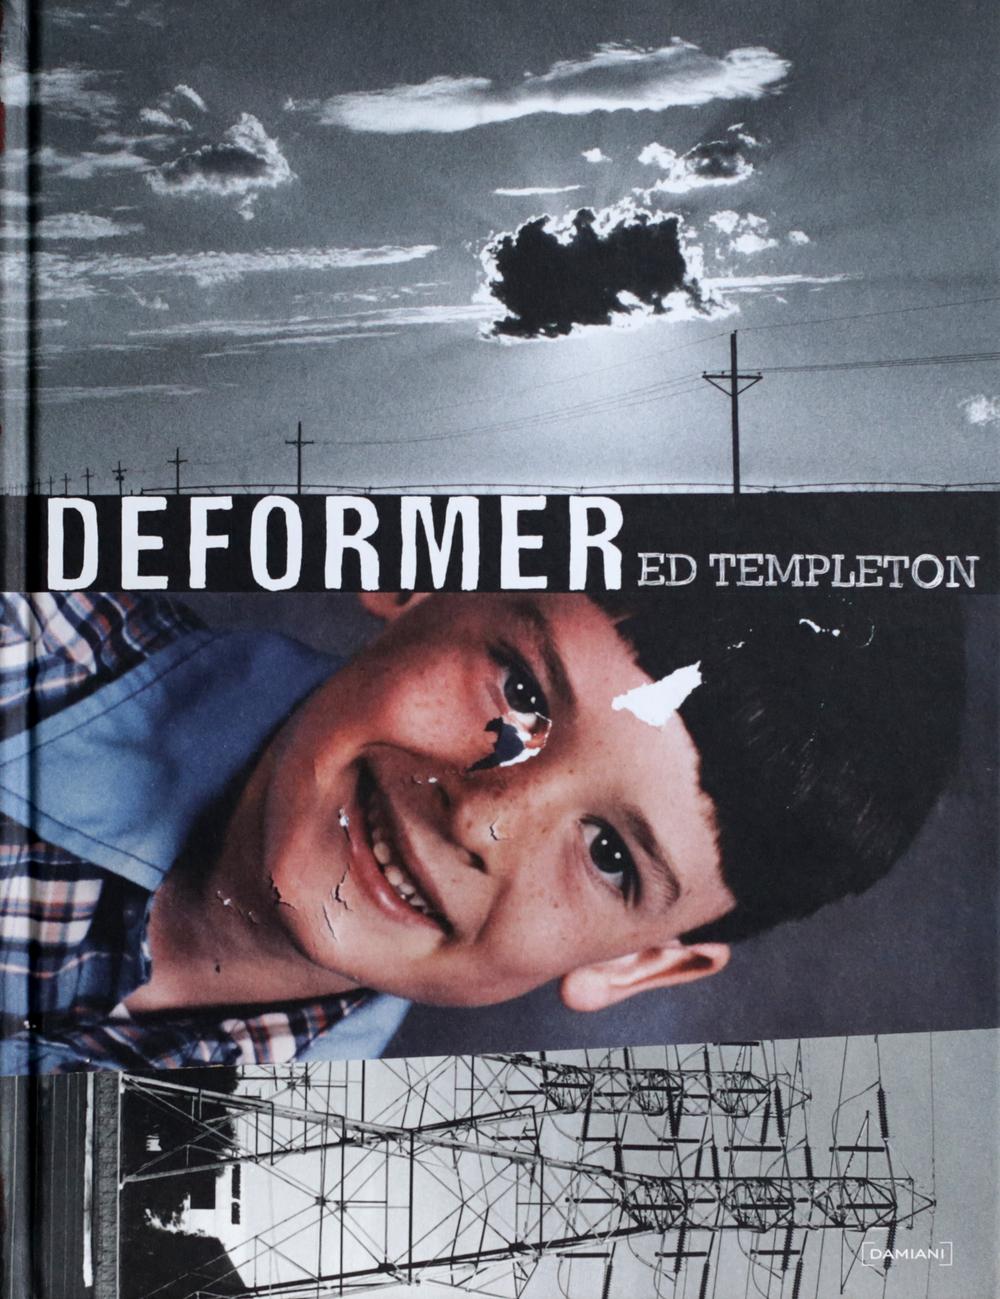 Ed Templeton - Deformer